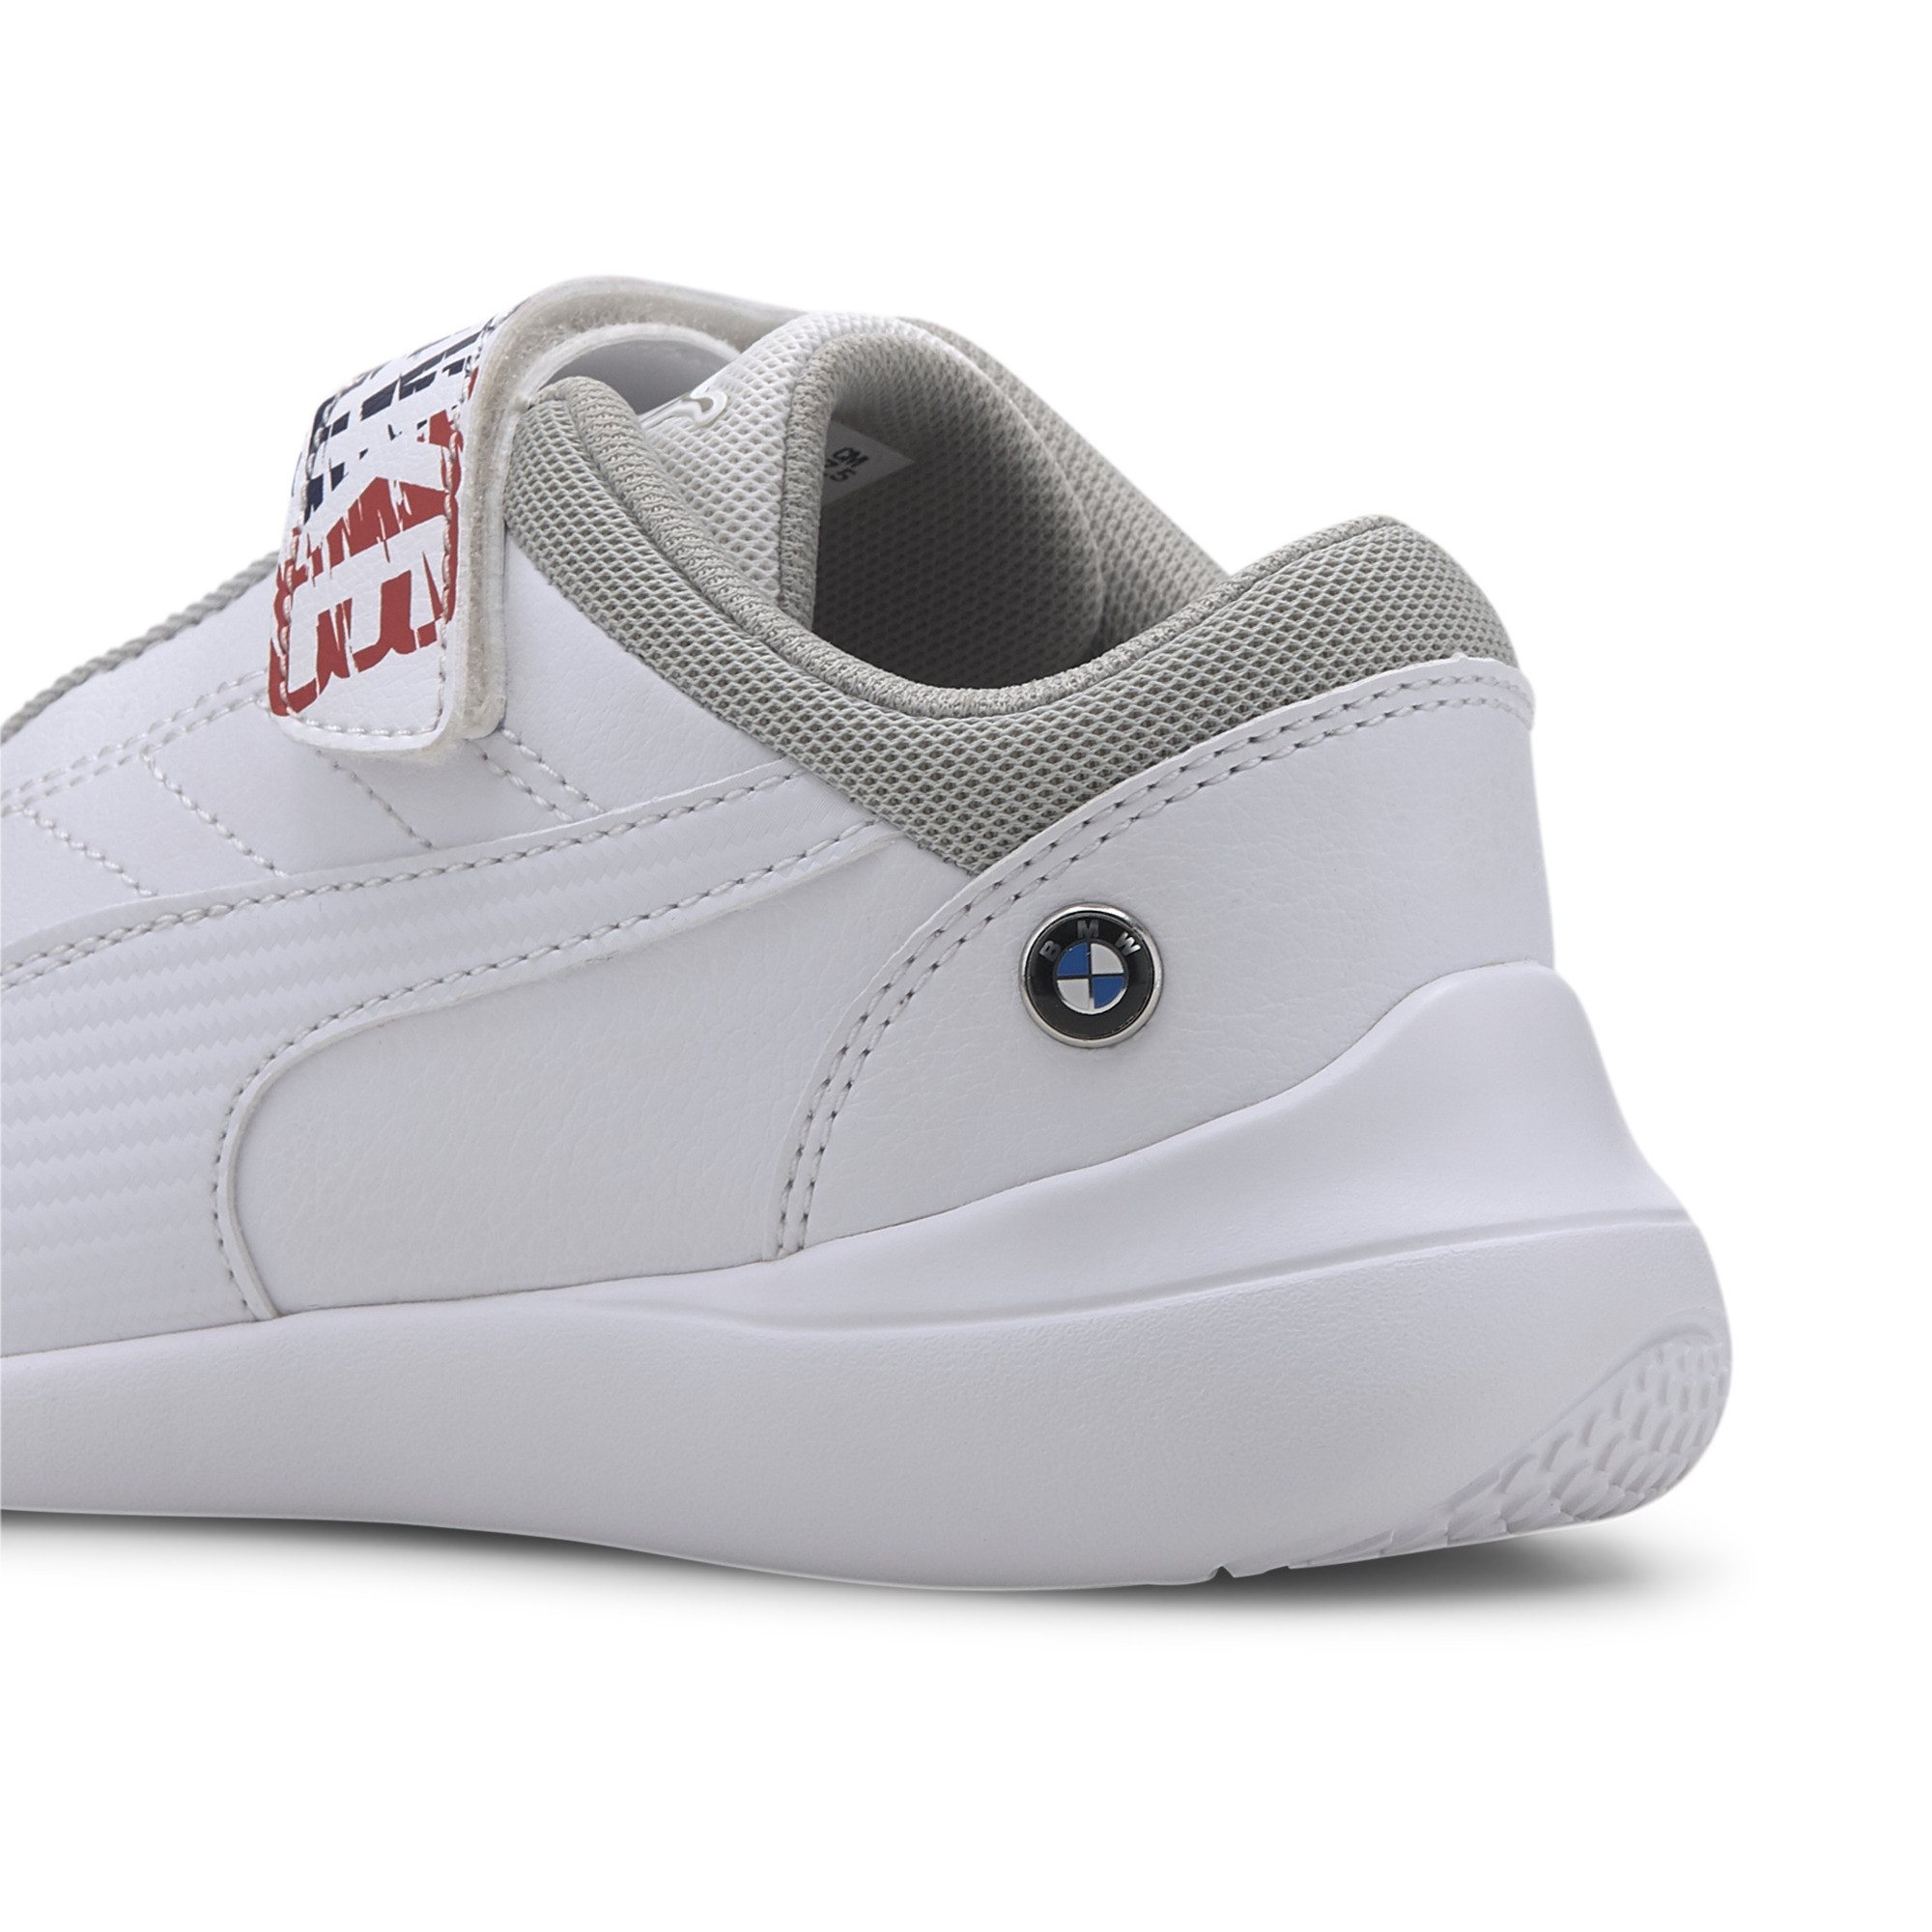 PUMA-Pre-School-BMW-M-Motorsport-Kart-Cat-III-Shoes thumbnail 15